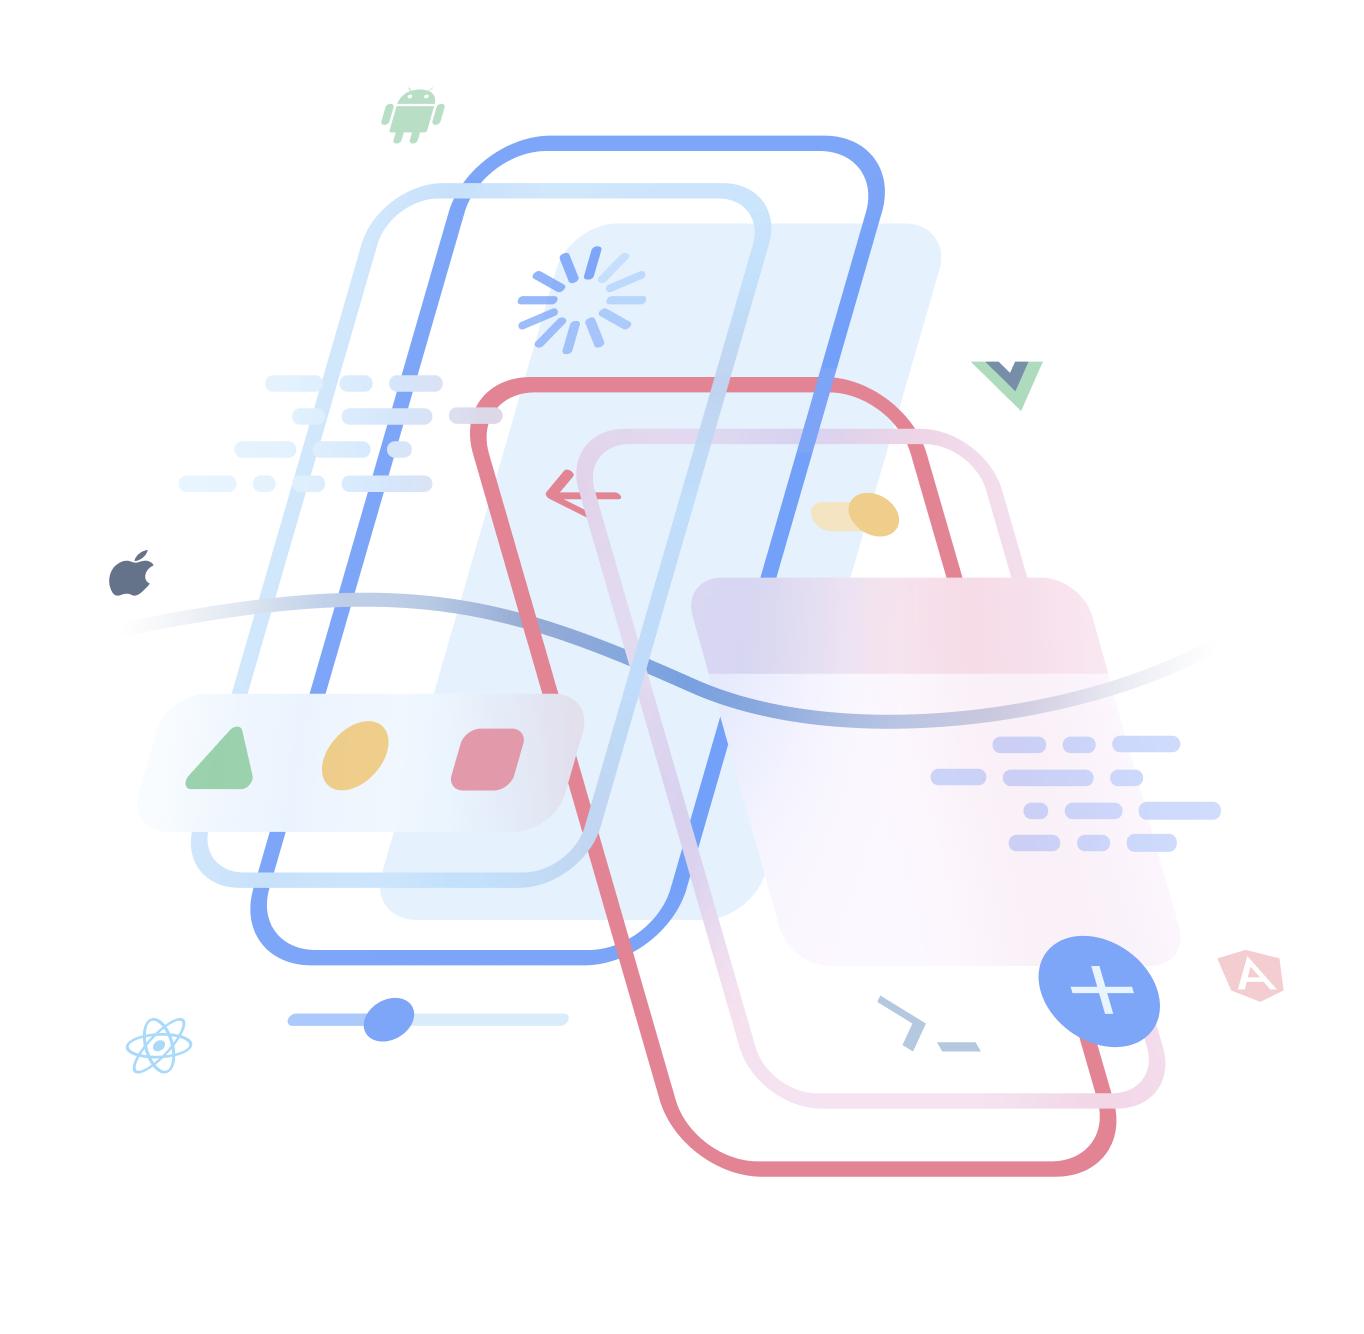 Ionic - Cross-Platform Mobile App Development